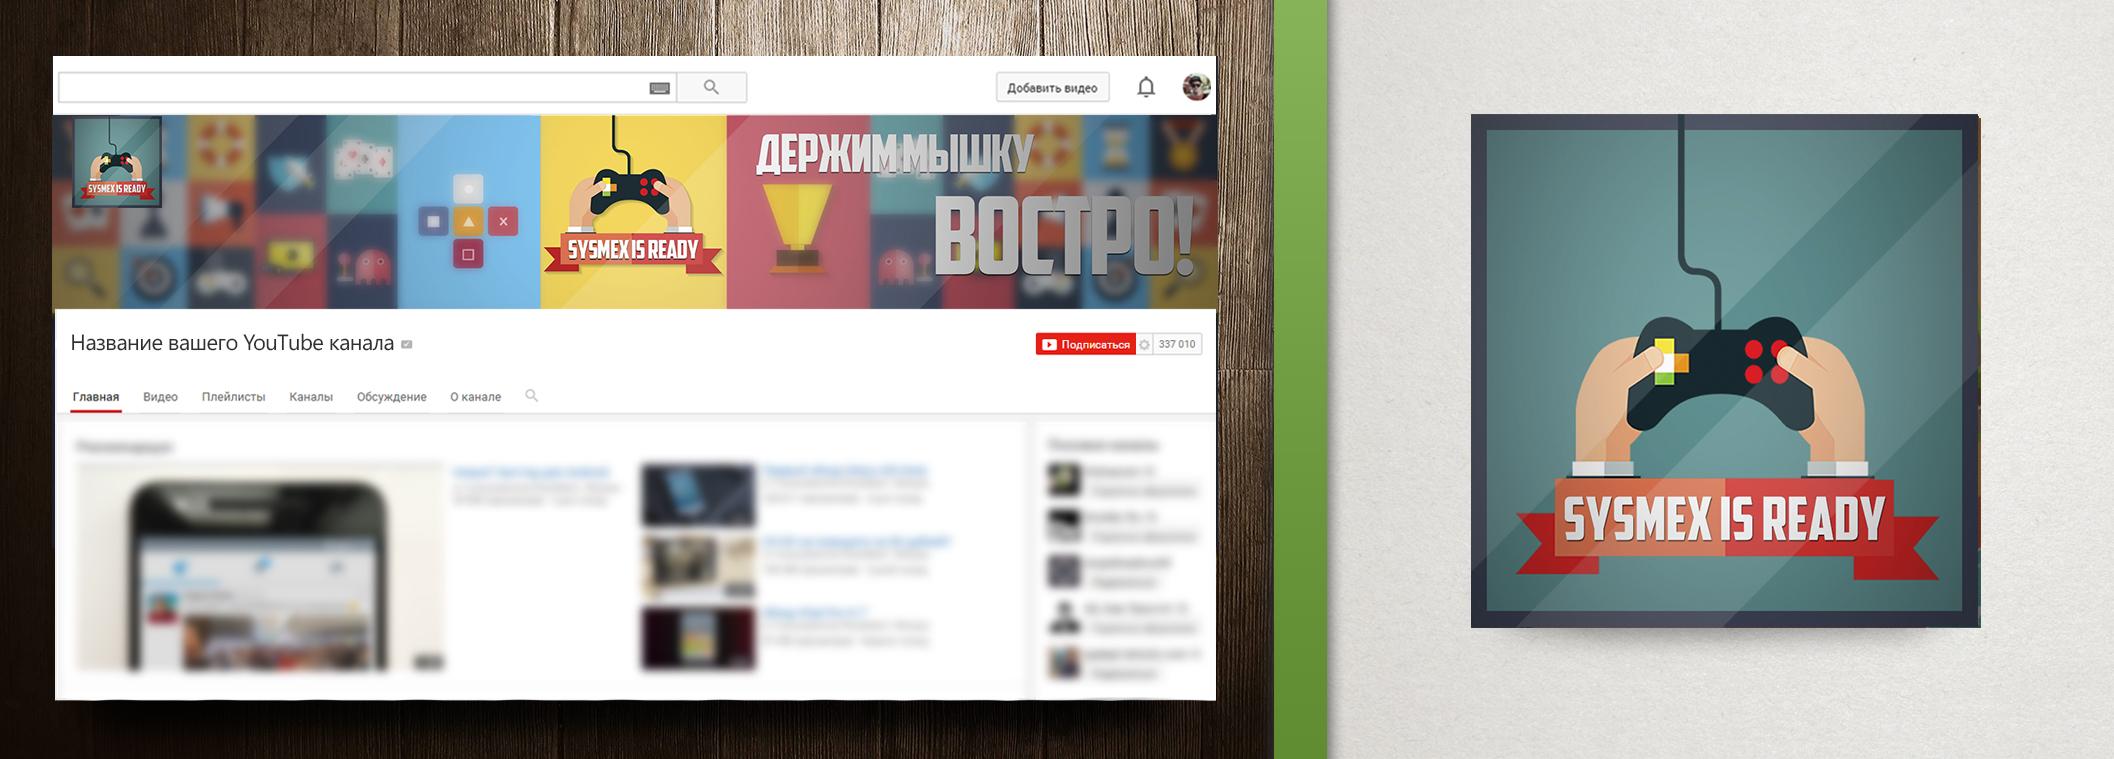 Дизайн YouTube канала Sysmex is Ready